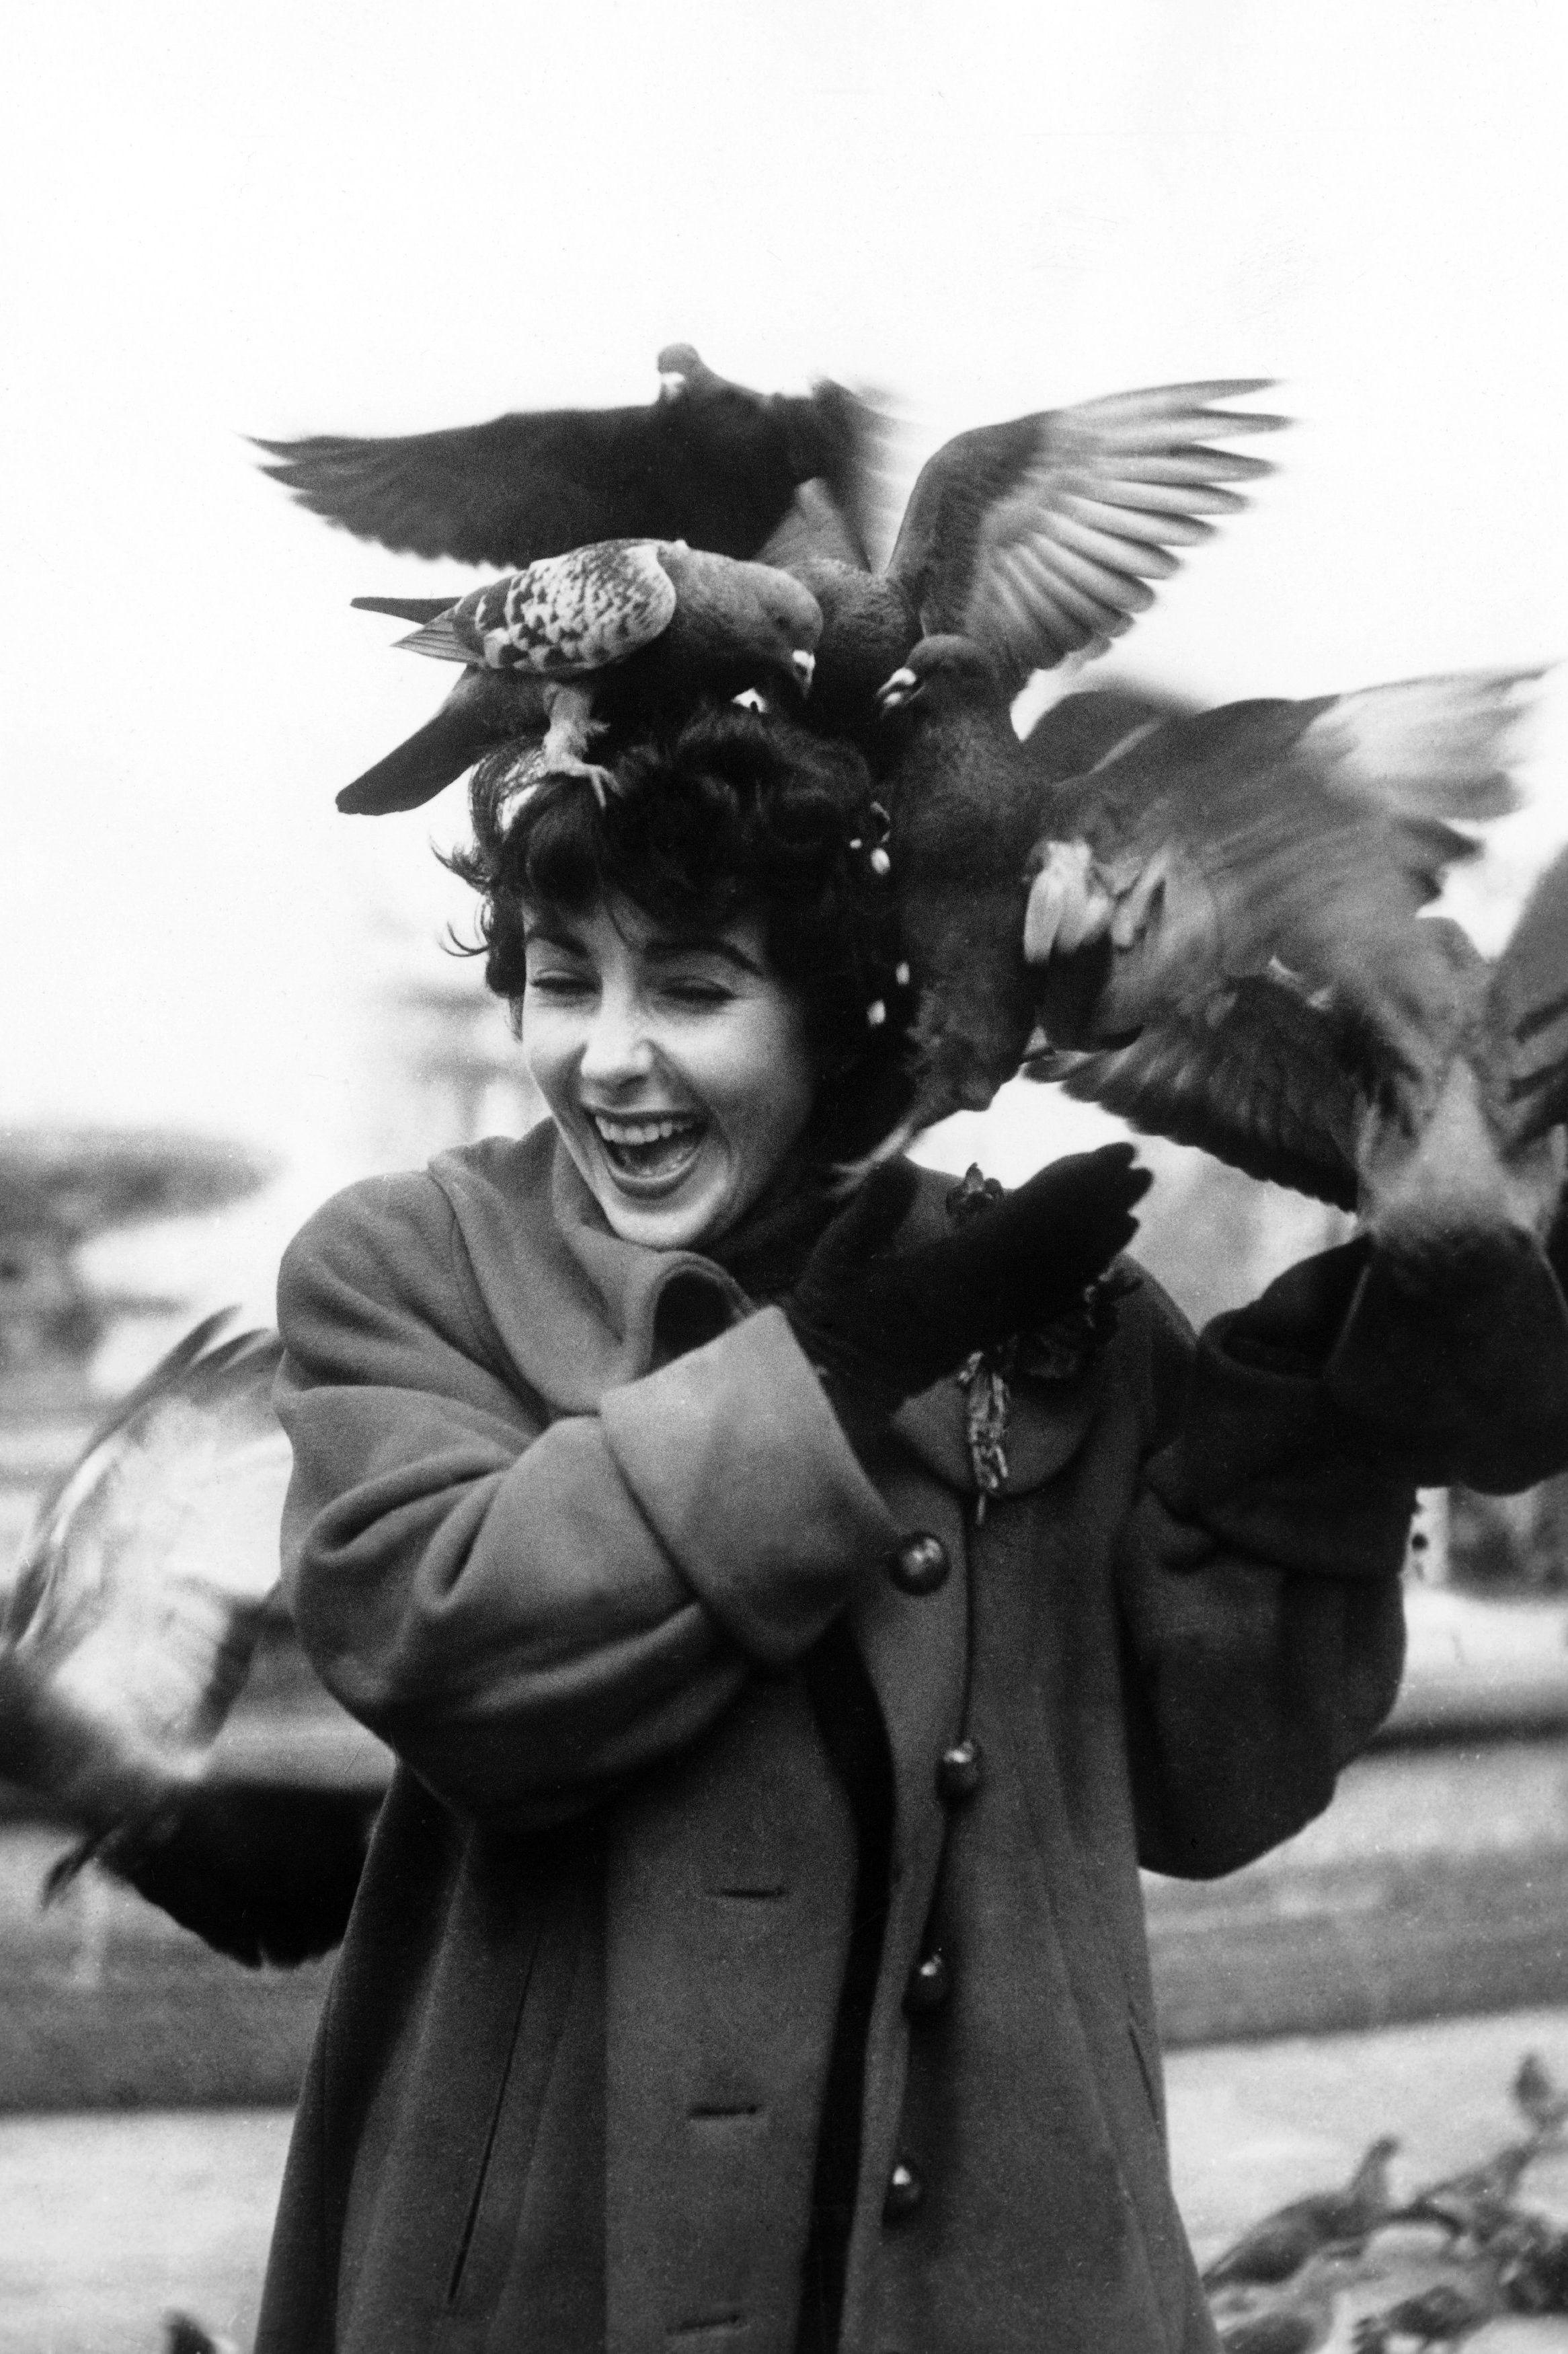 In 1948.